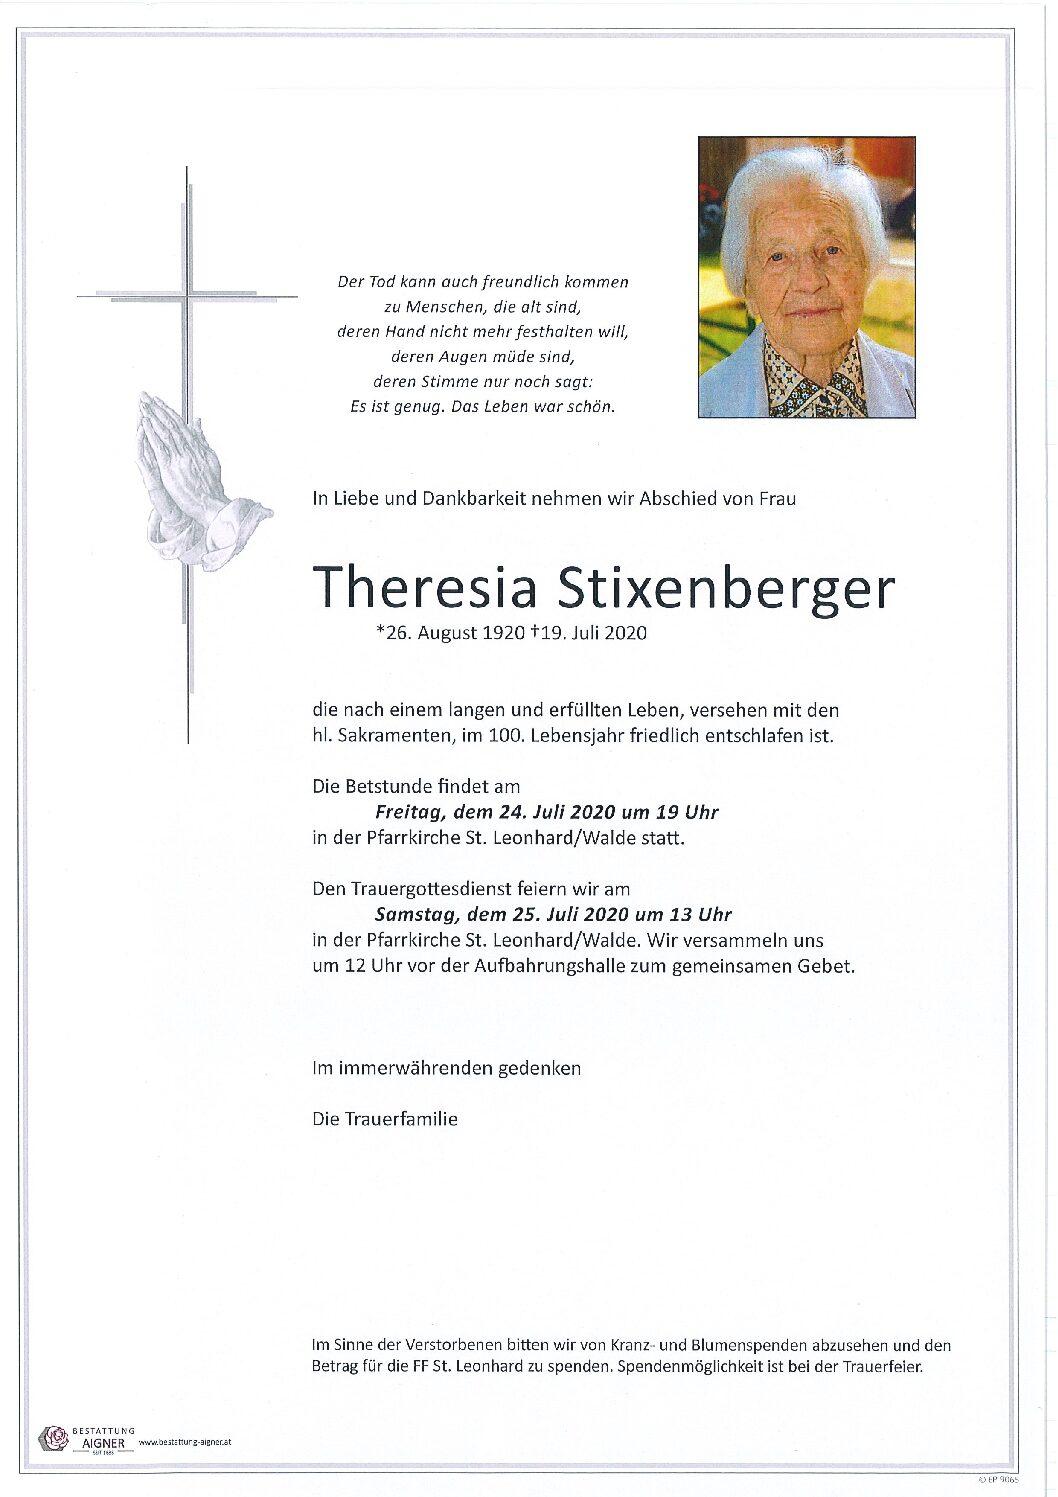 Theresia Stixenberger